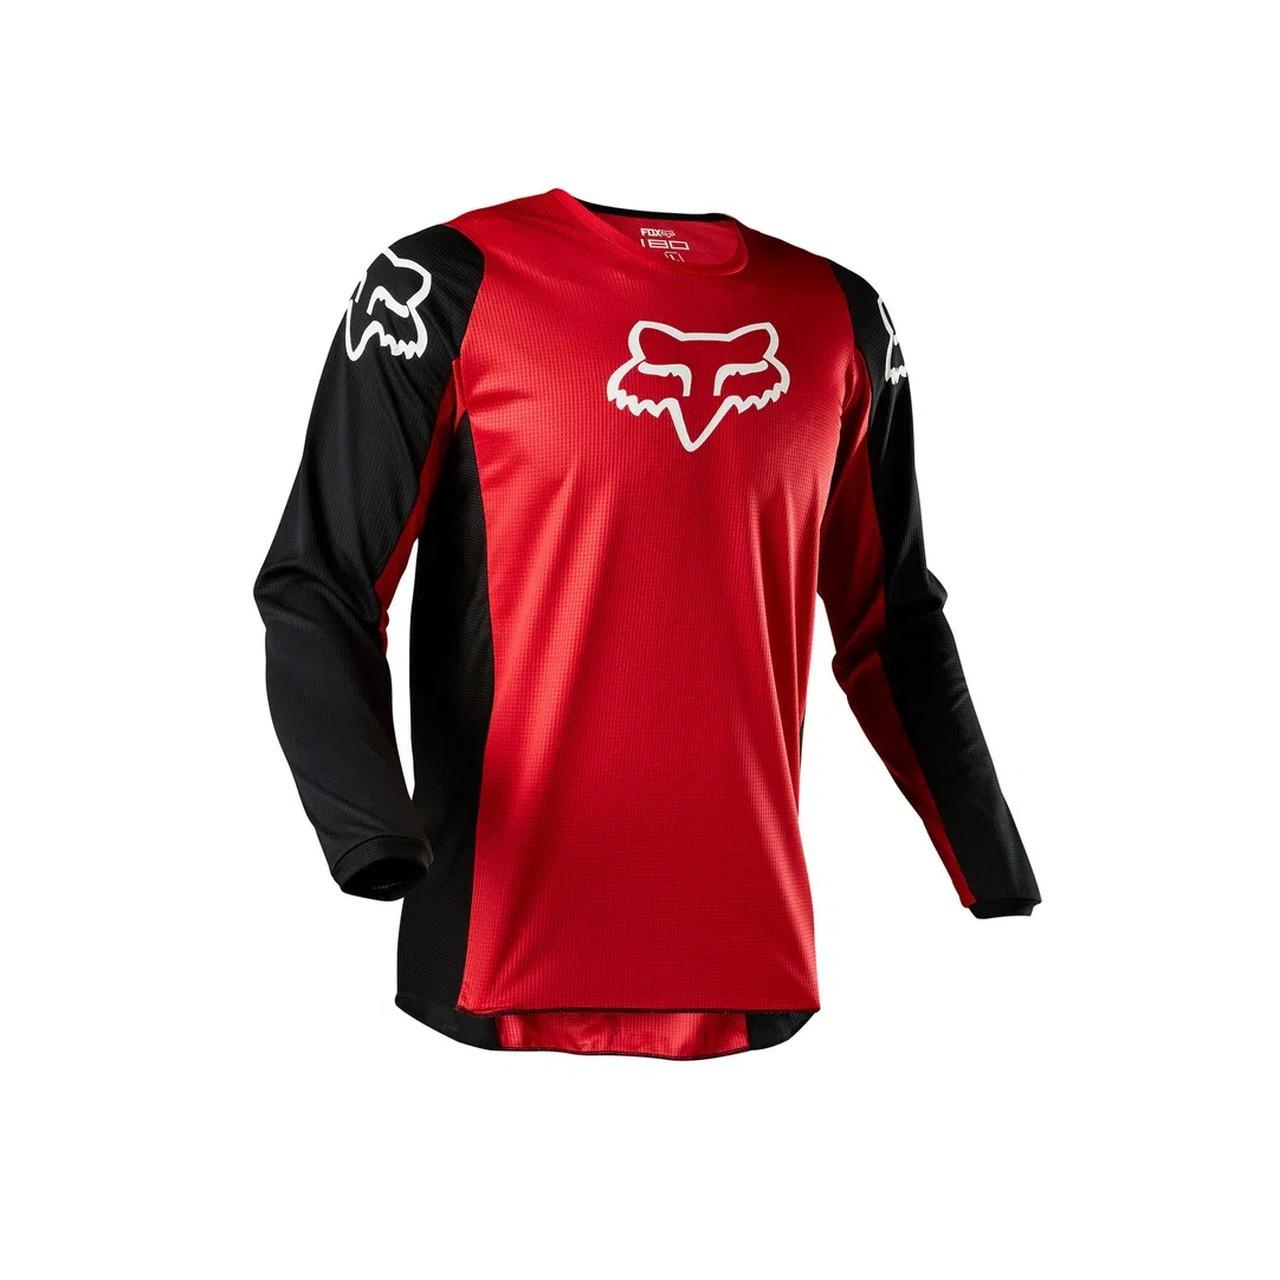 Camisa FOX 180 PRIX